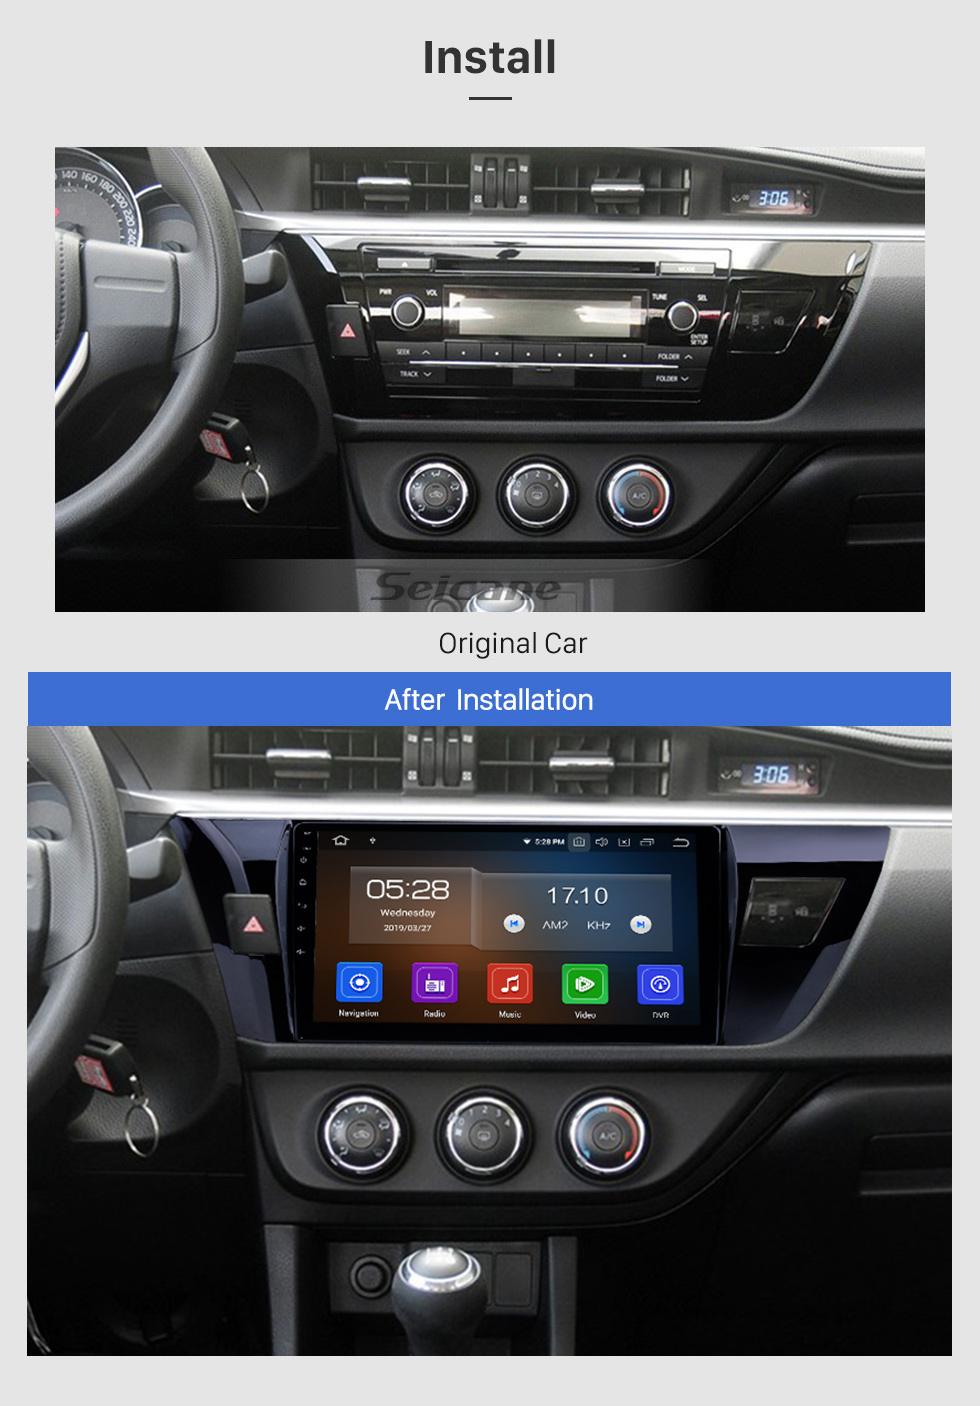 Seicane Android 9.0 10.1 дюймов 2013 2014 2015 Система GPS Toyota Corolla (LHD) с HD 1024 * 600 Сенсорный экран Радио Bluetooth OBD2 DVR камера заднего вида TV 1080P 4G WIFI рулевым управлением USB RDS Зеркало связи